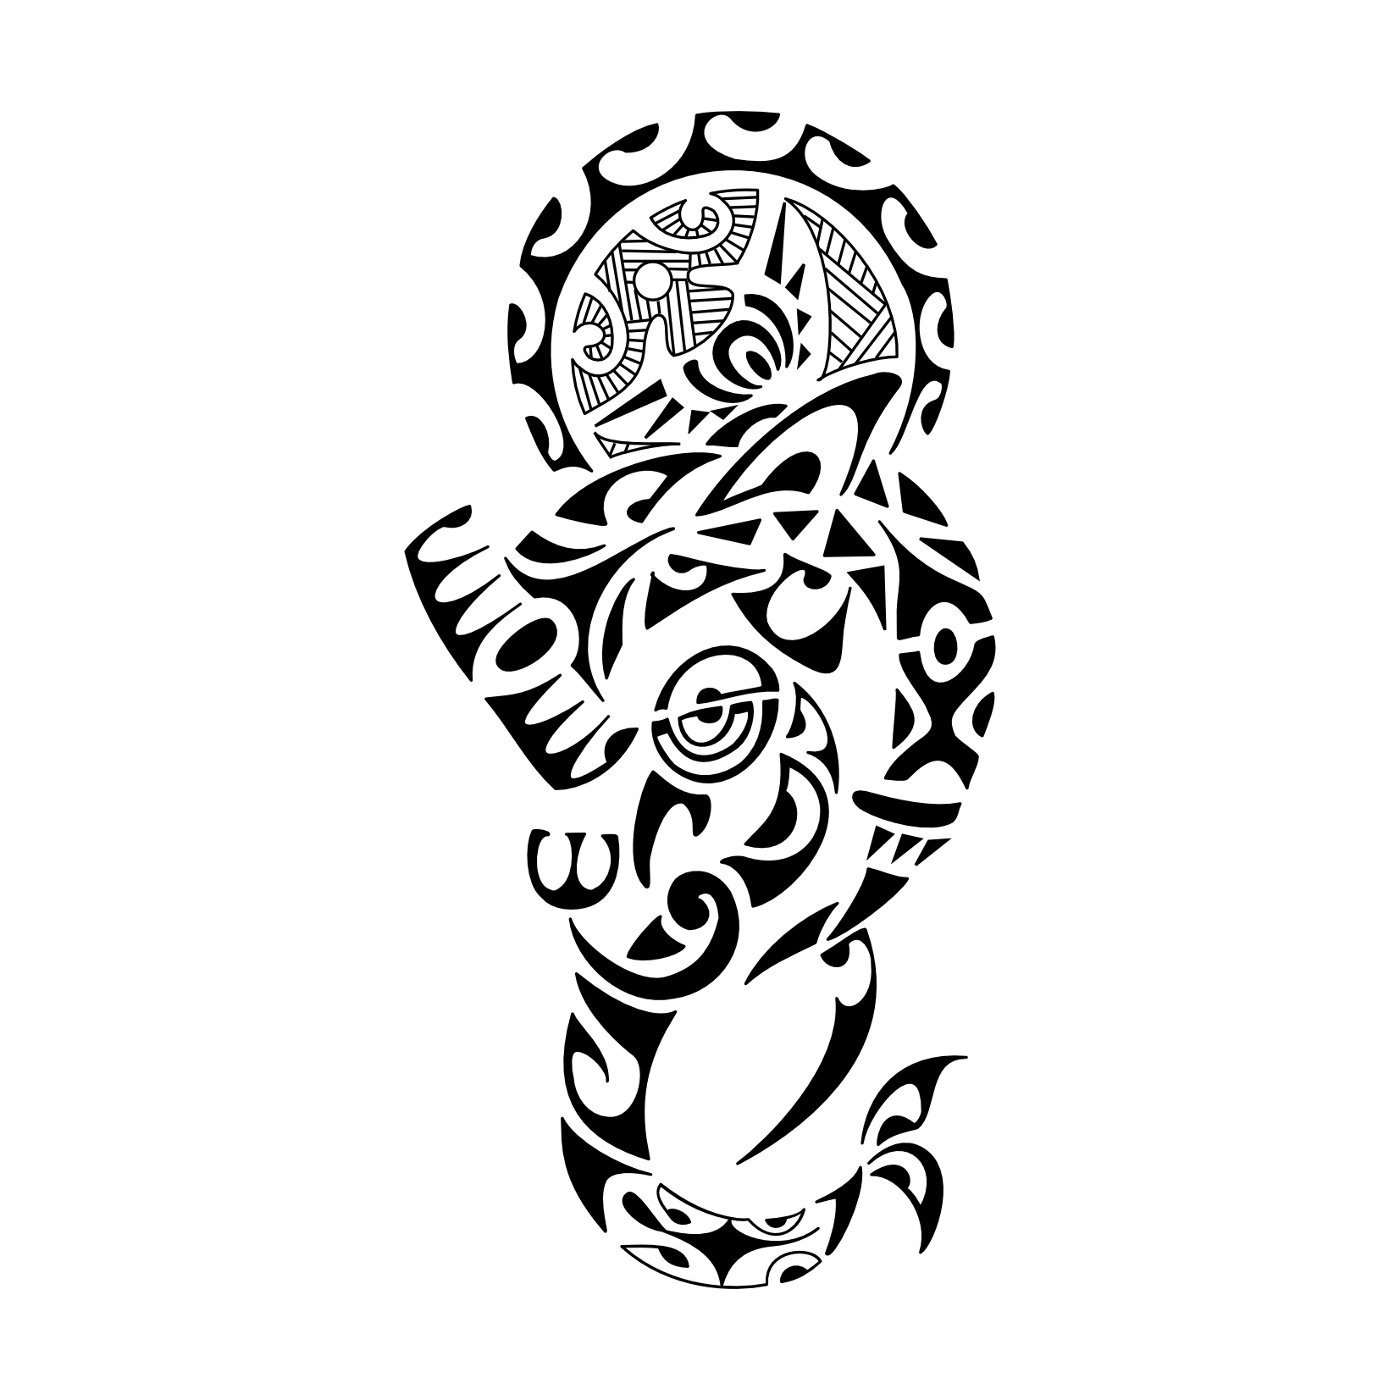 Blu sky tattoo studio maori significato 82 for Tattoo simboli di vita